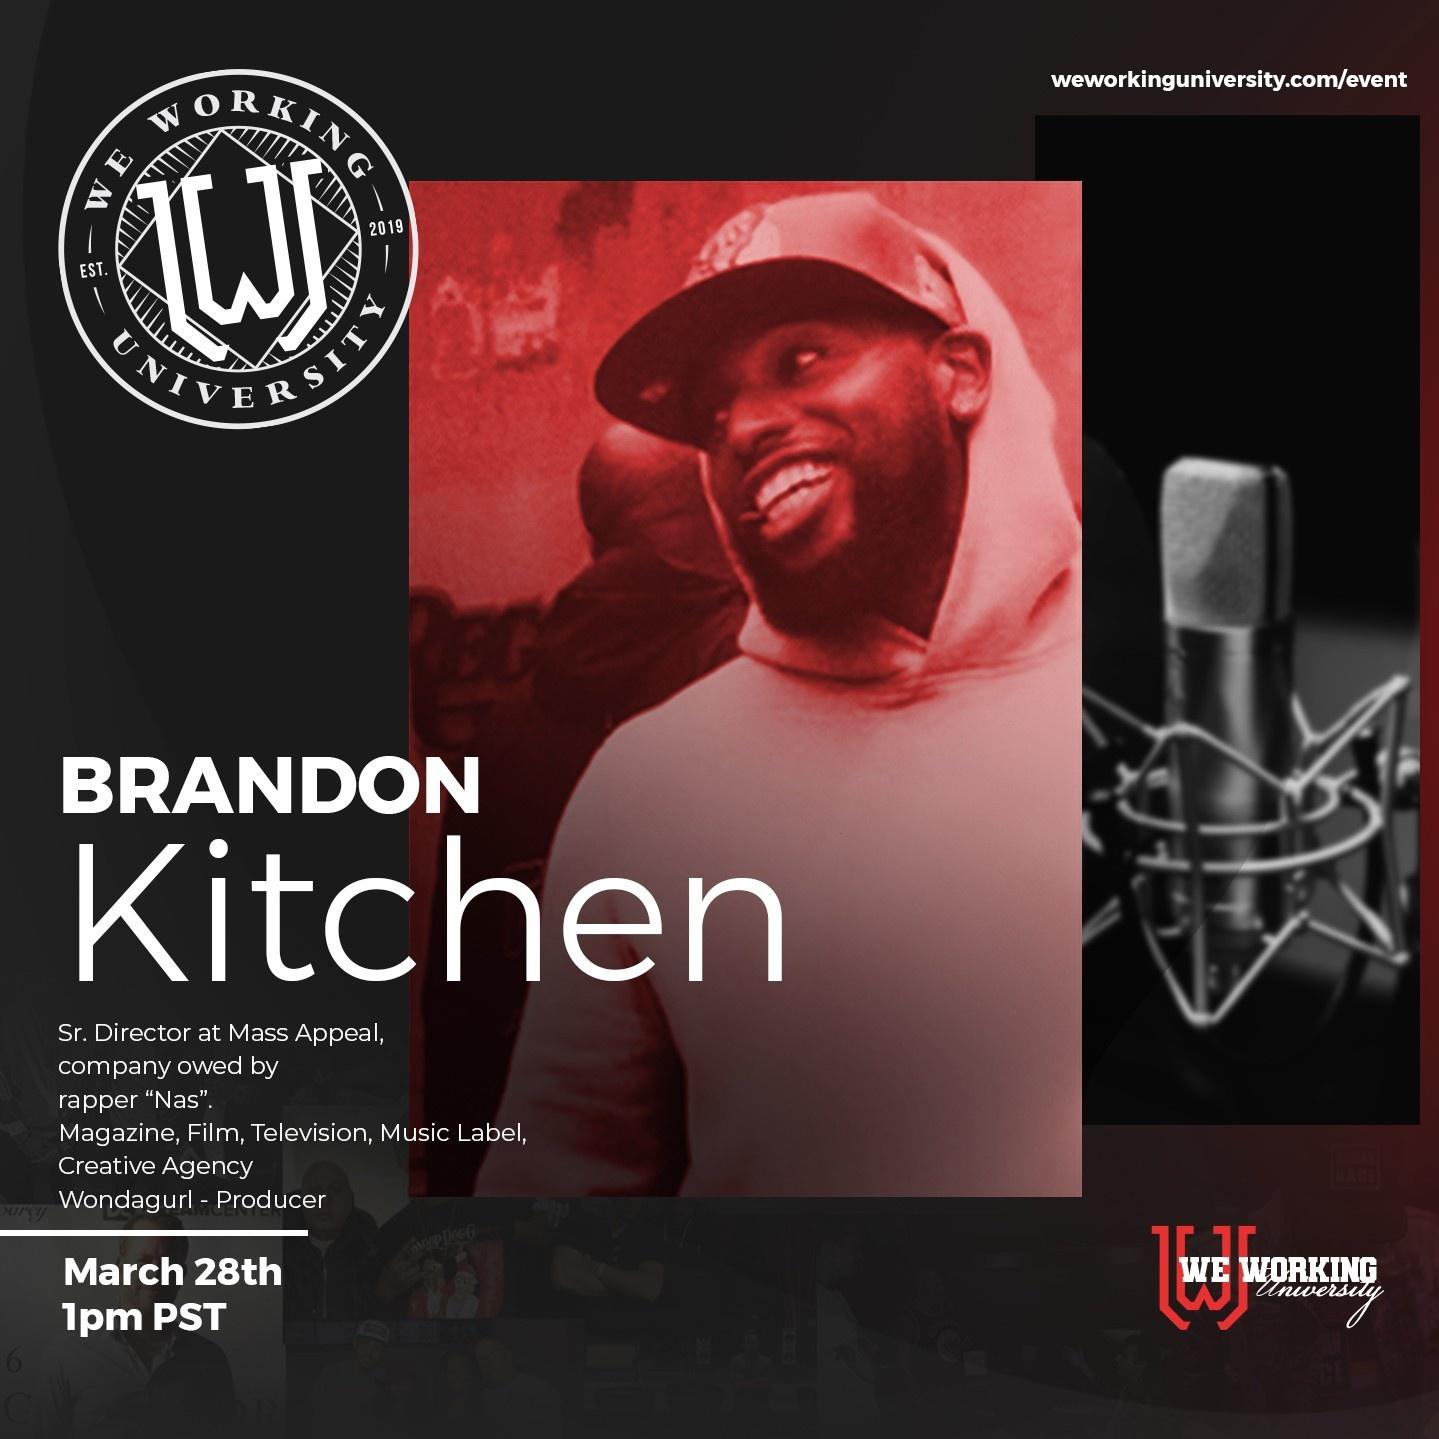 70Fire2VSxiLYbYSewwN_We_working_Brandon